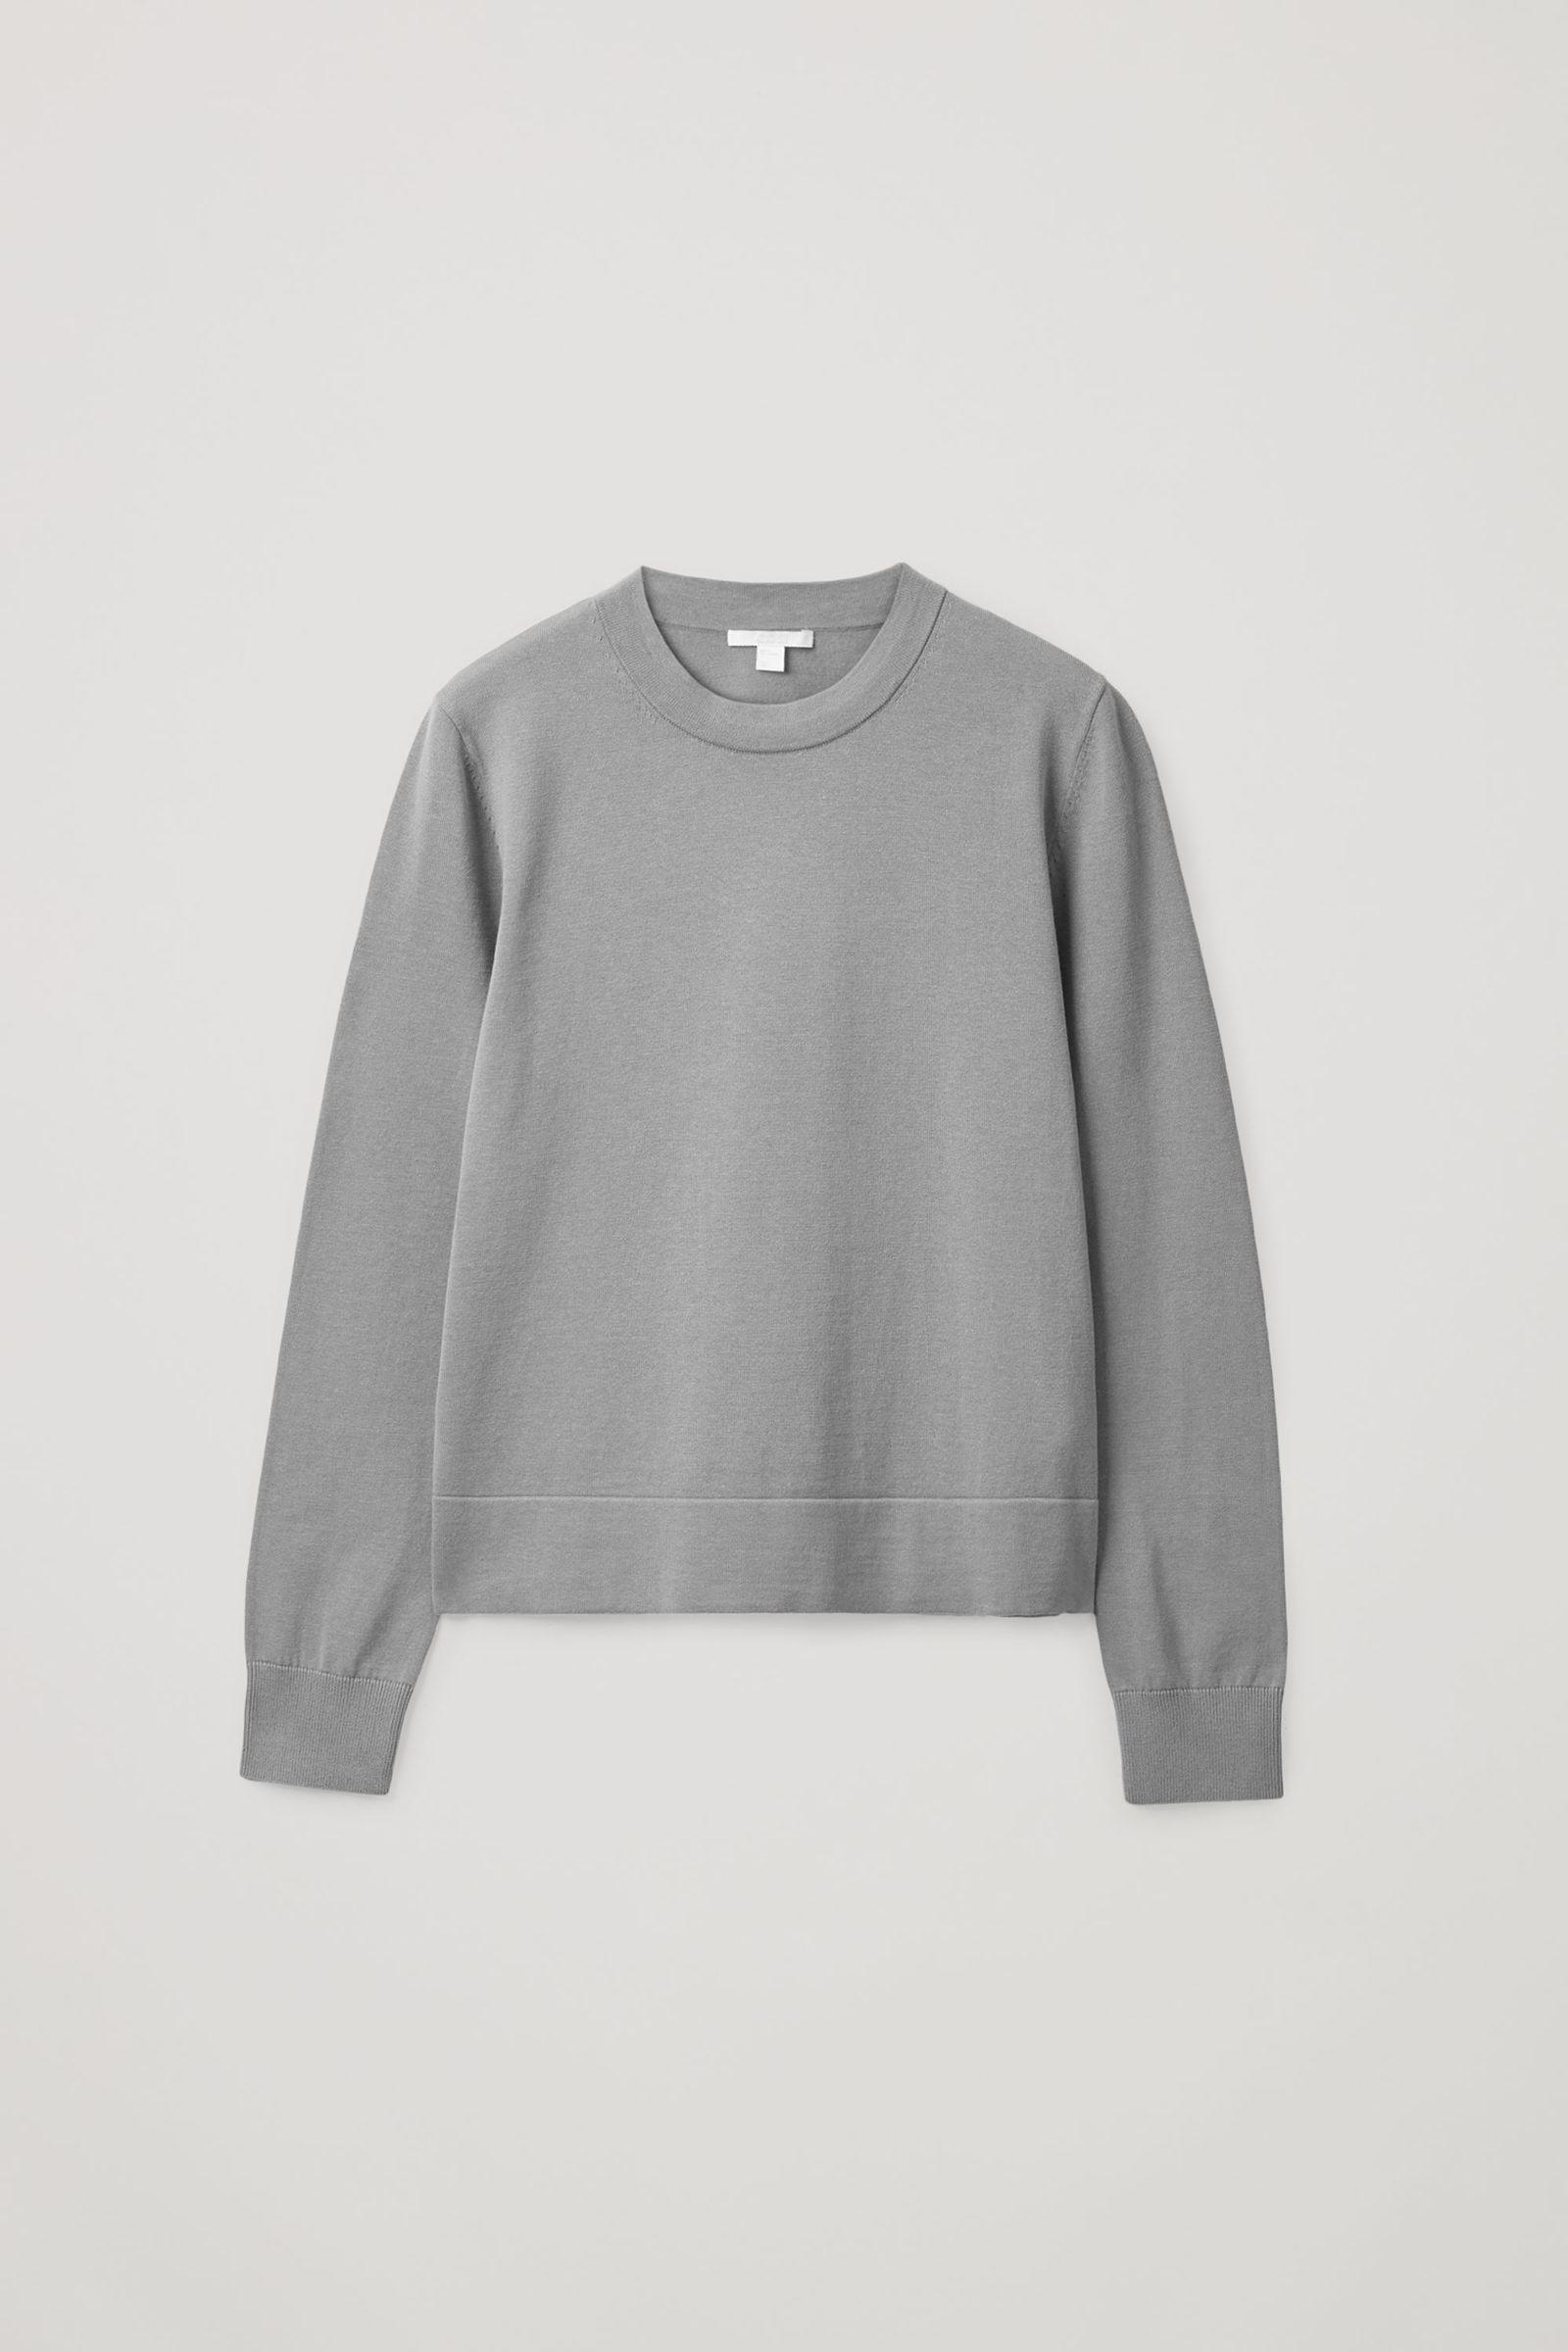 COS 레귤러 핏 스웨터의 스페이스 그레이컬러 Product입니다.